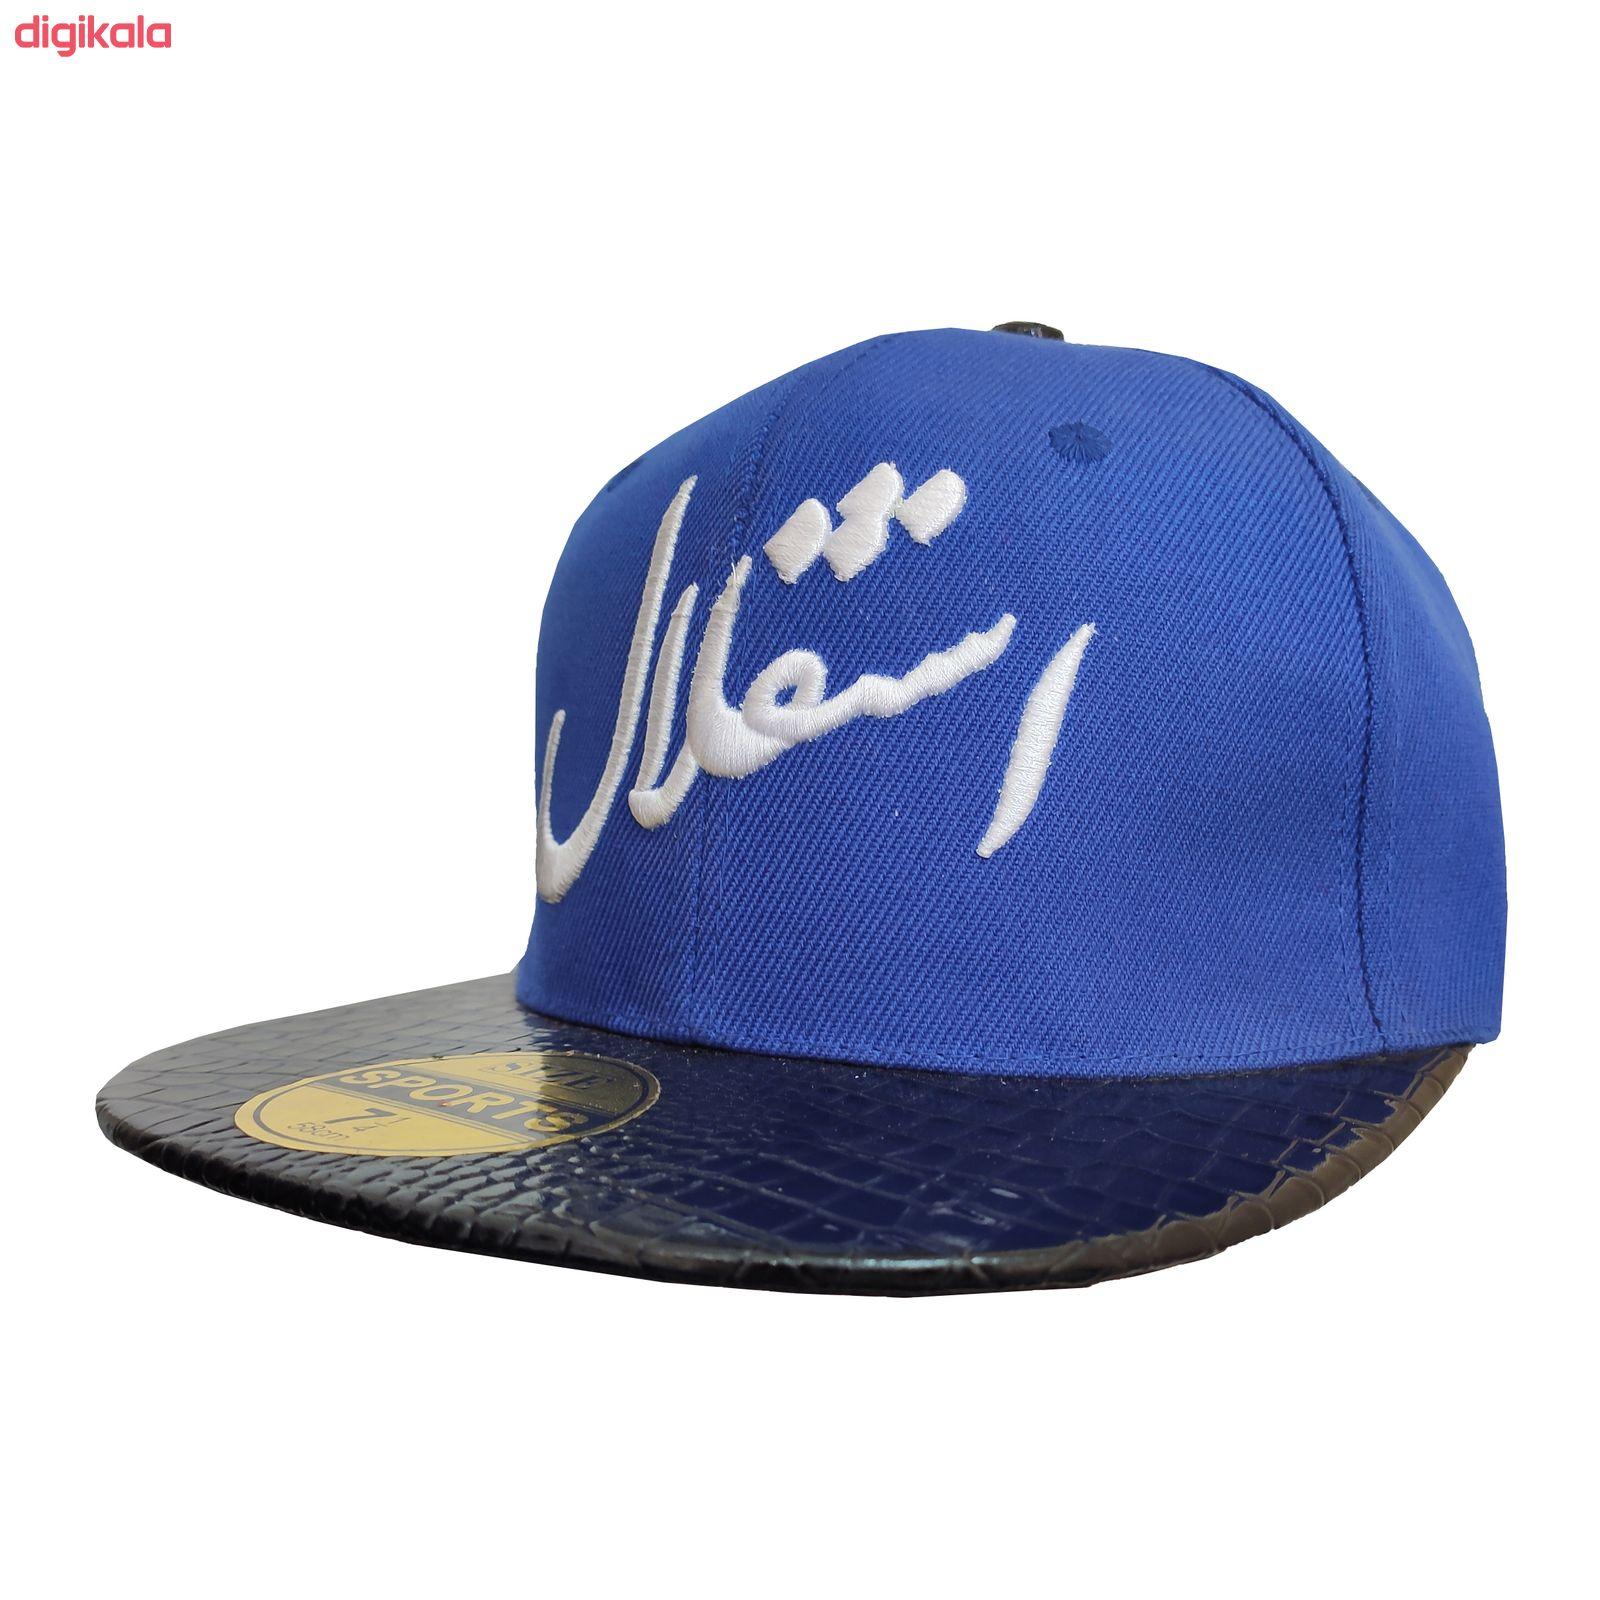 کلاه کپ مردانه طرح استقلال کد30331  main 1 1